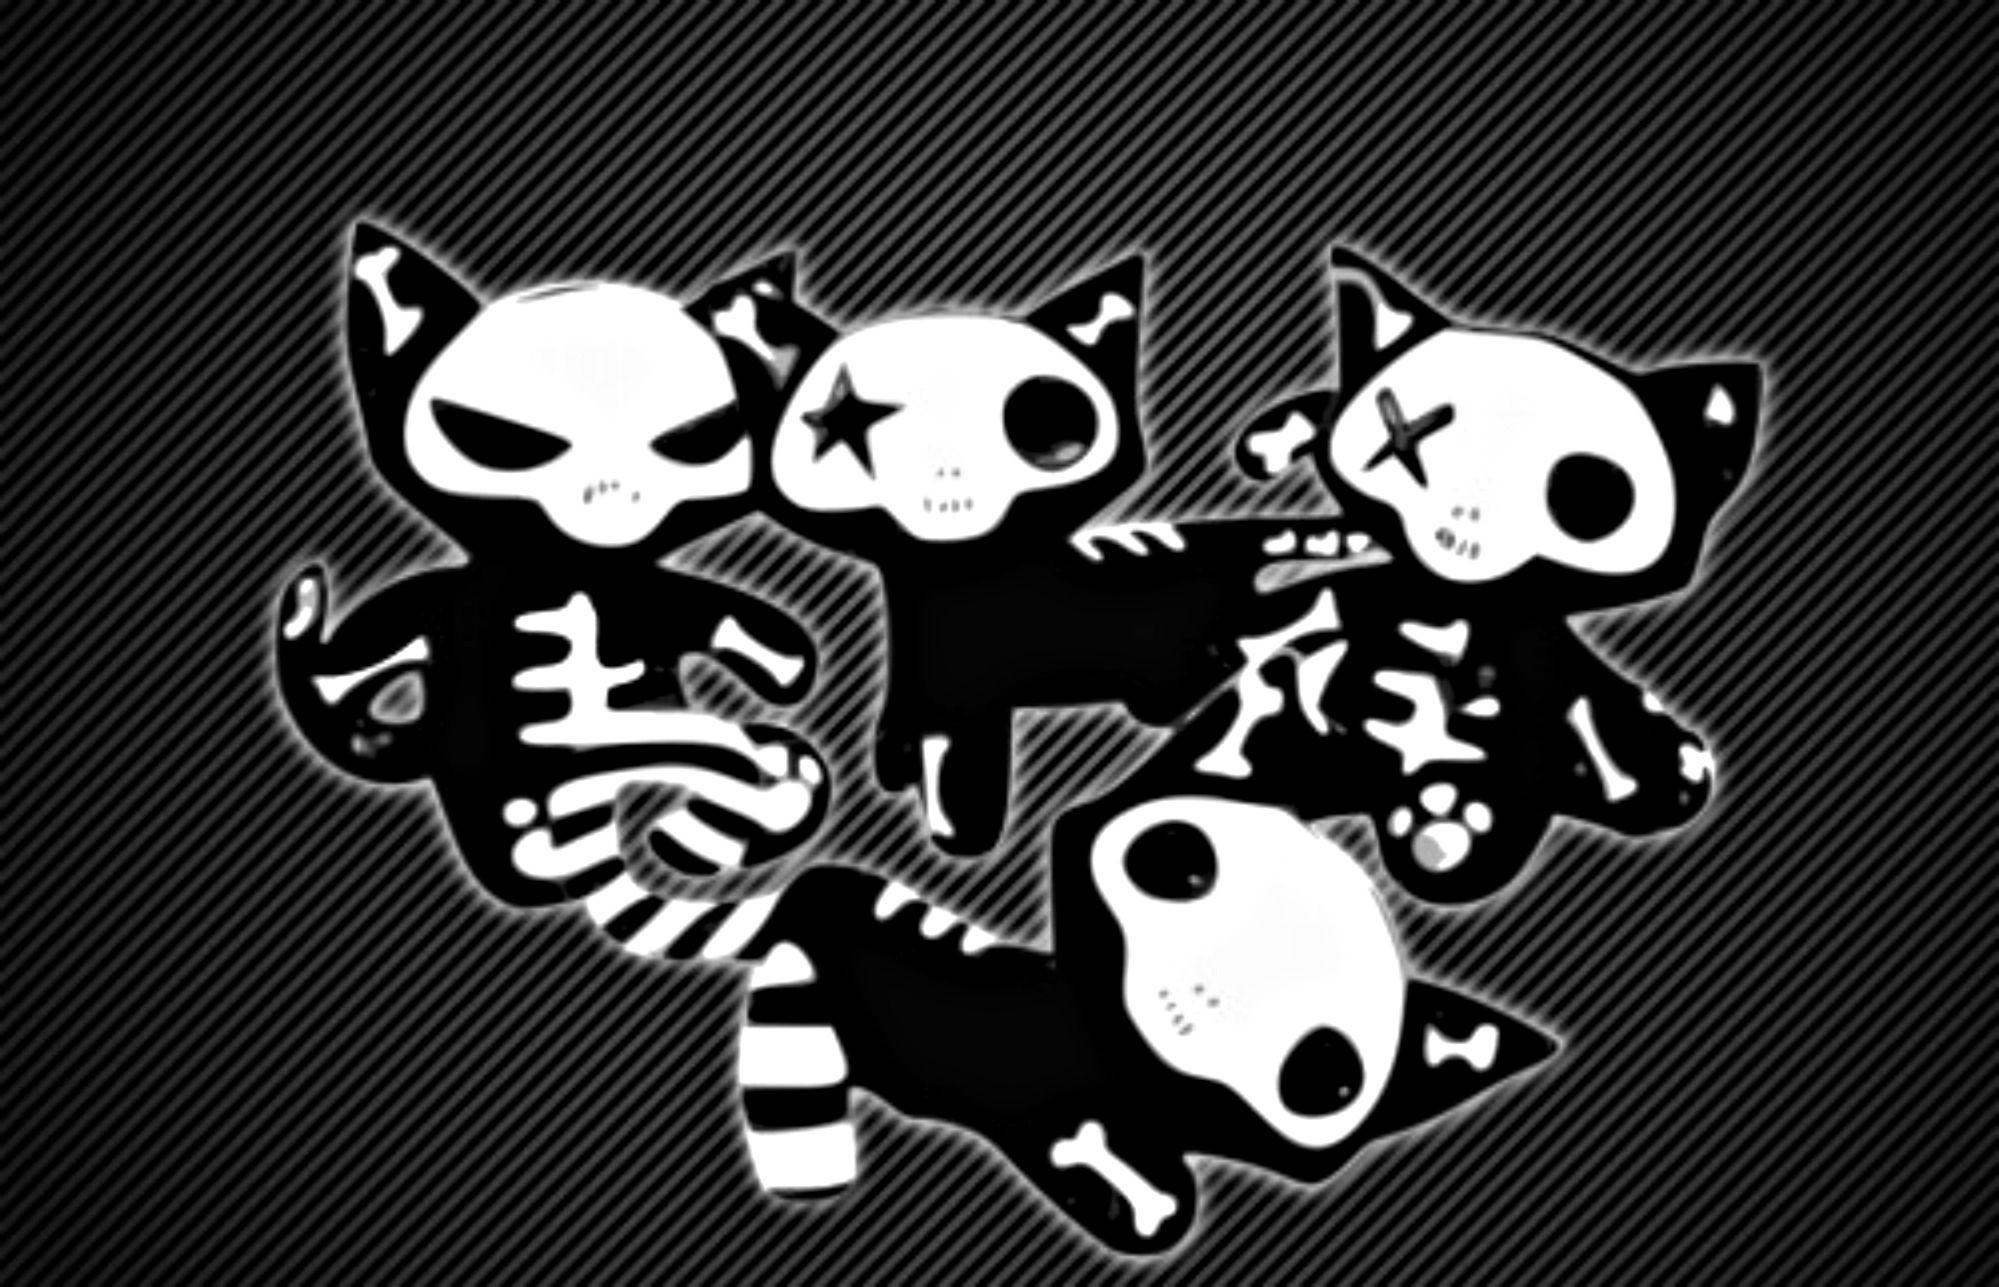 Res: 1999x1287, Girly Skull Desktop Wallpaper